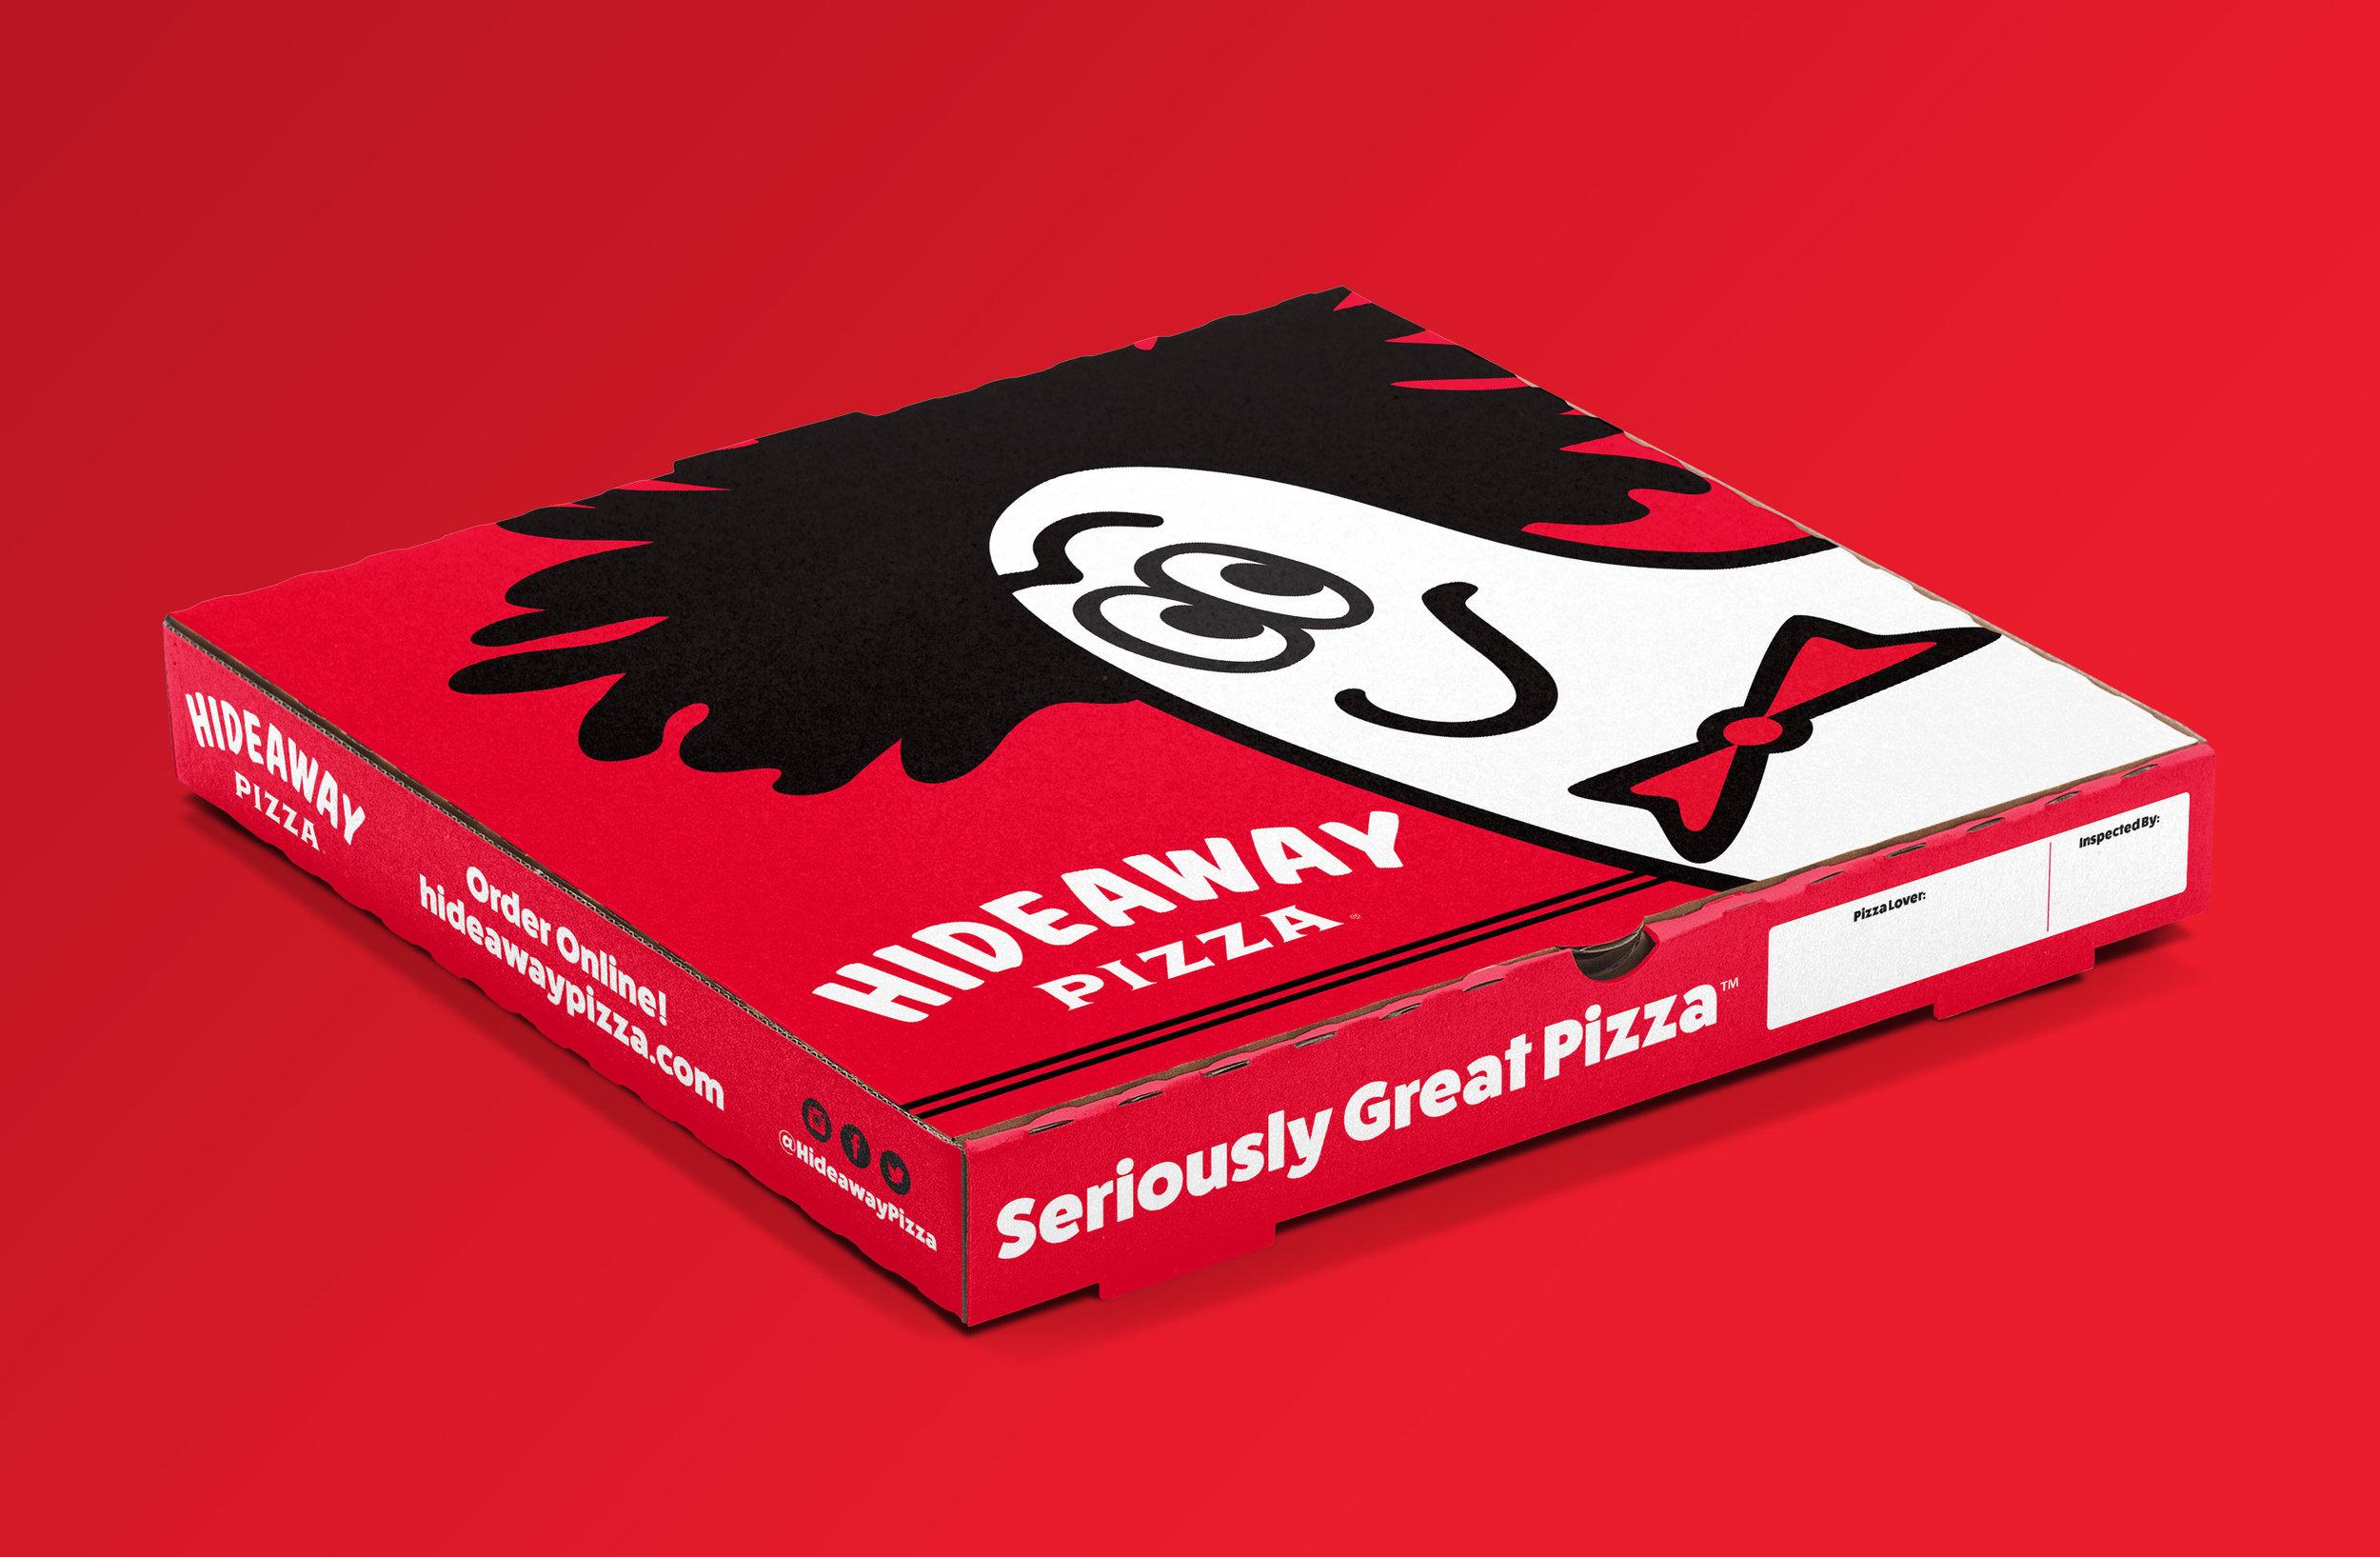 HideawayPizza_Box.jpg